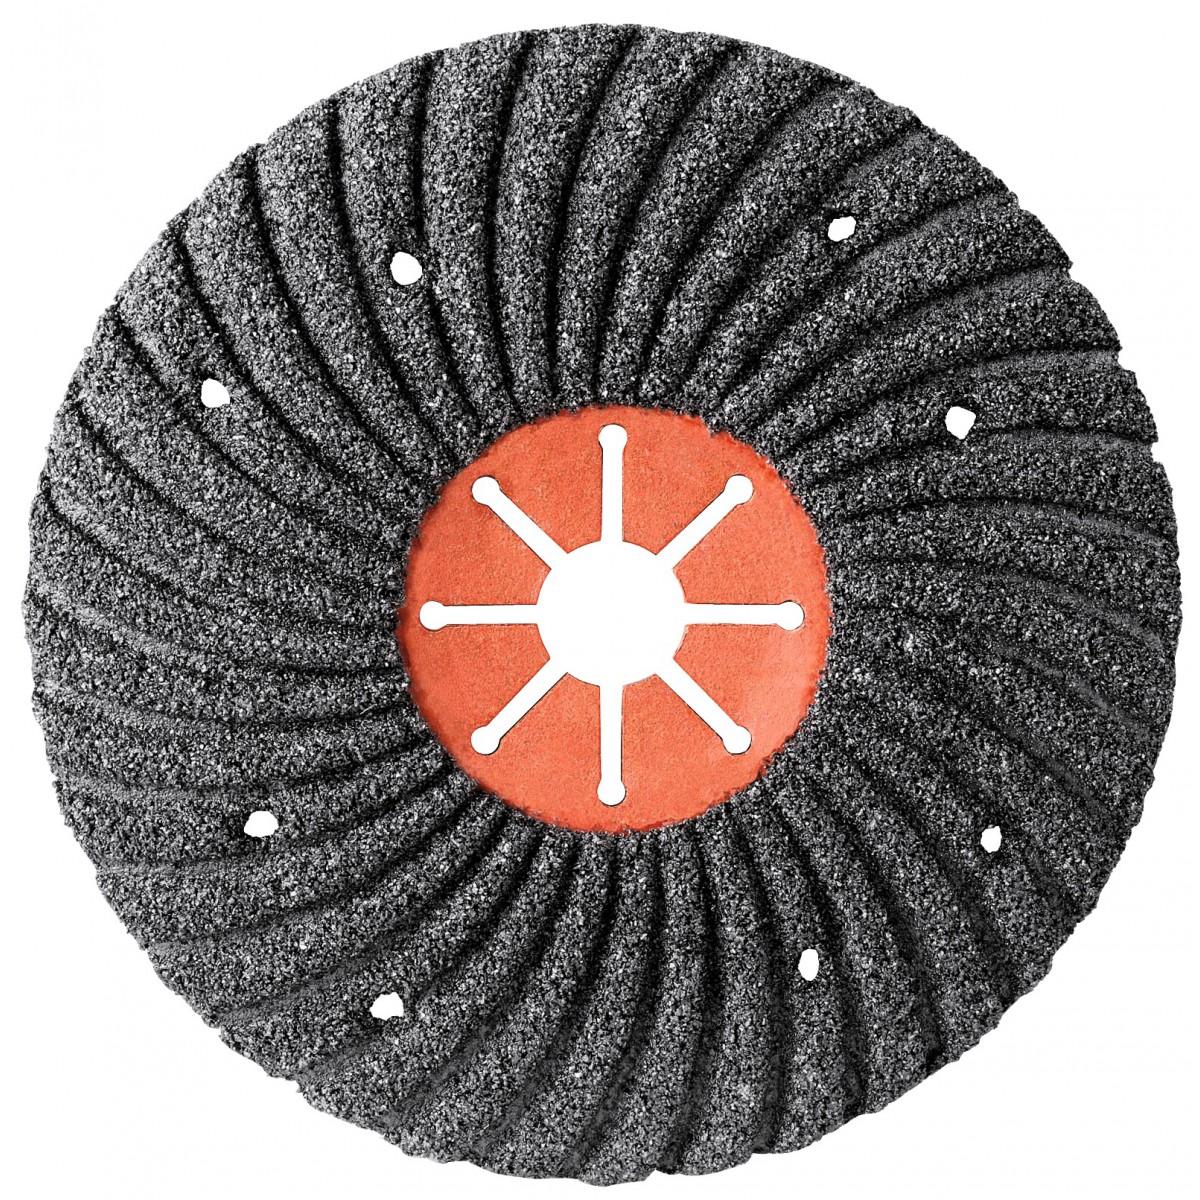 Disque semiflexible carbure de silicium diamètre 180 x 22 mm SCID - Grain 36